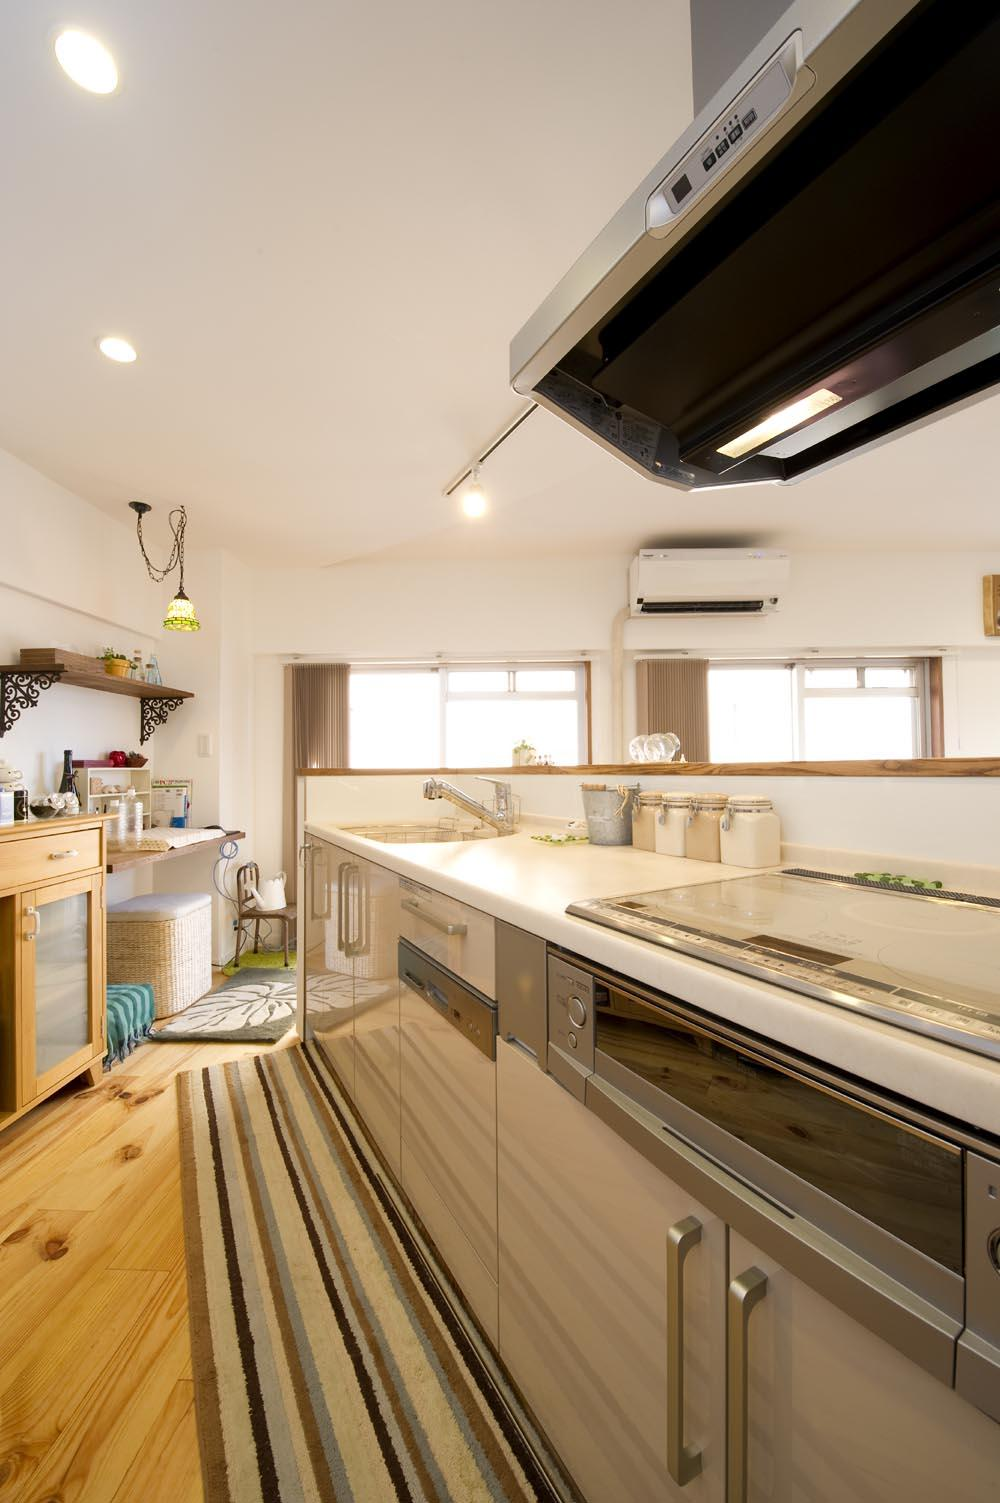 I邸・斜めに配置したキッチンで、動きと変化をの部屋 明るいキッチン